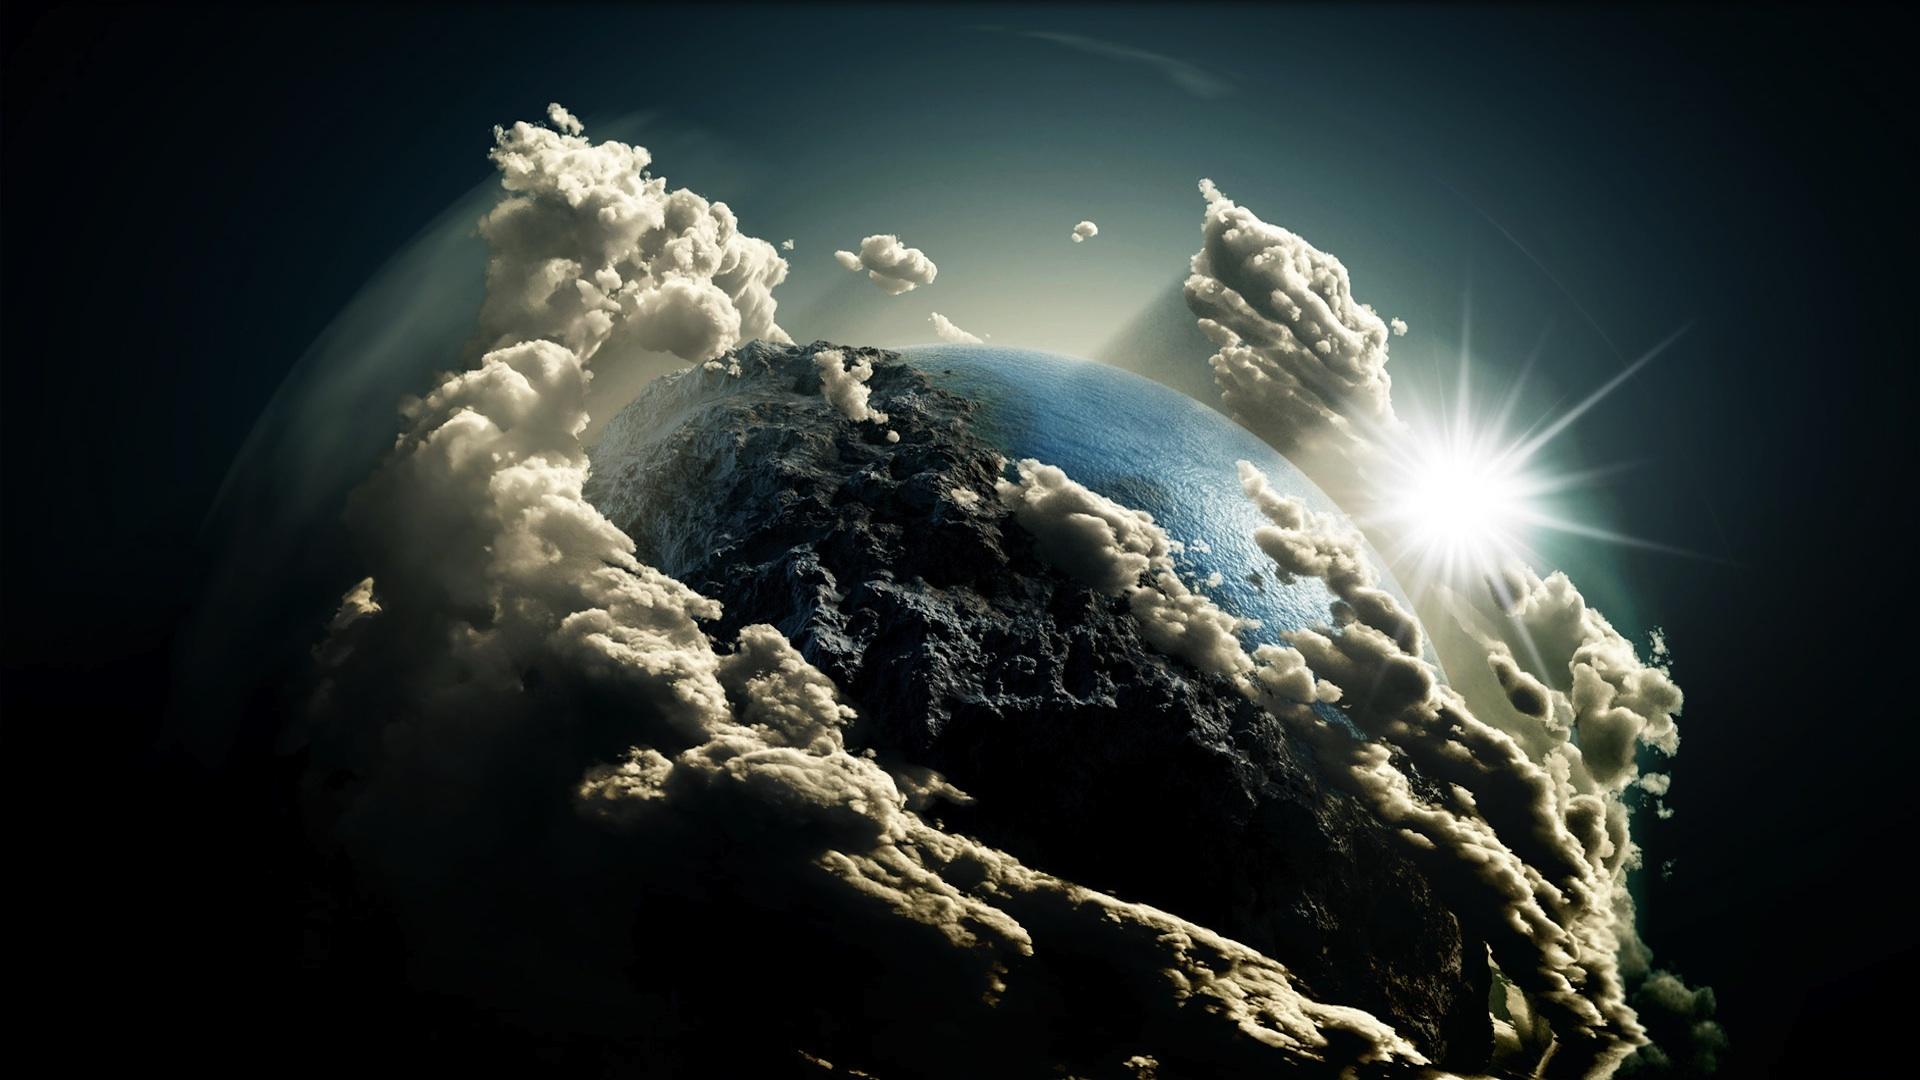 Earth Sky Sun Planets Clouds Wallpaper 1920x1080 47972 Wallpaperup